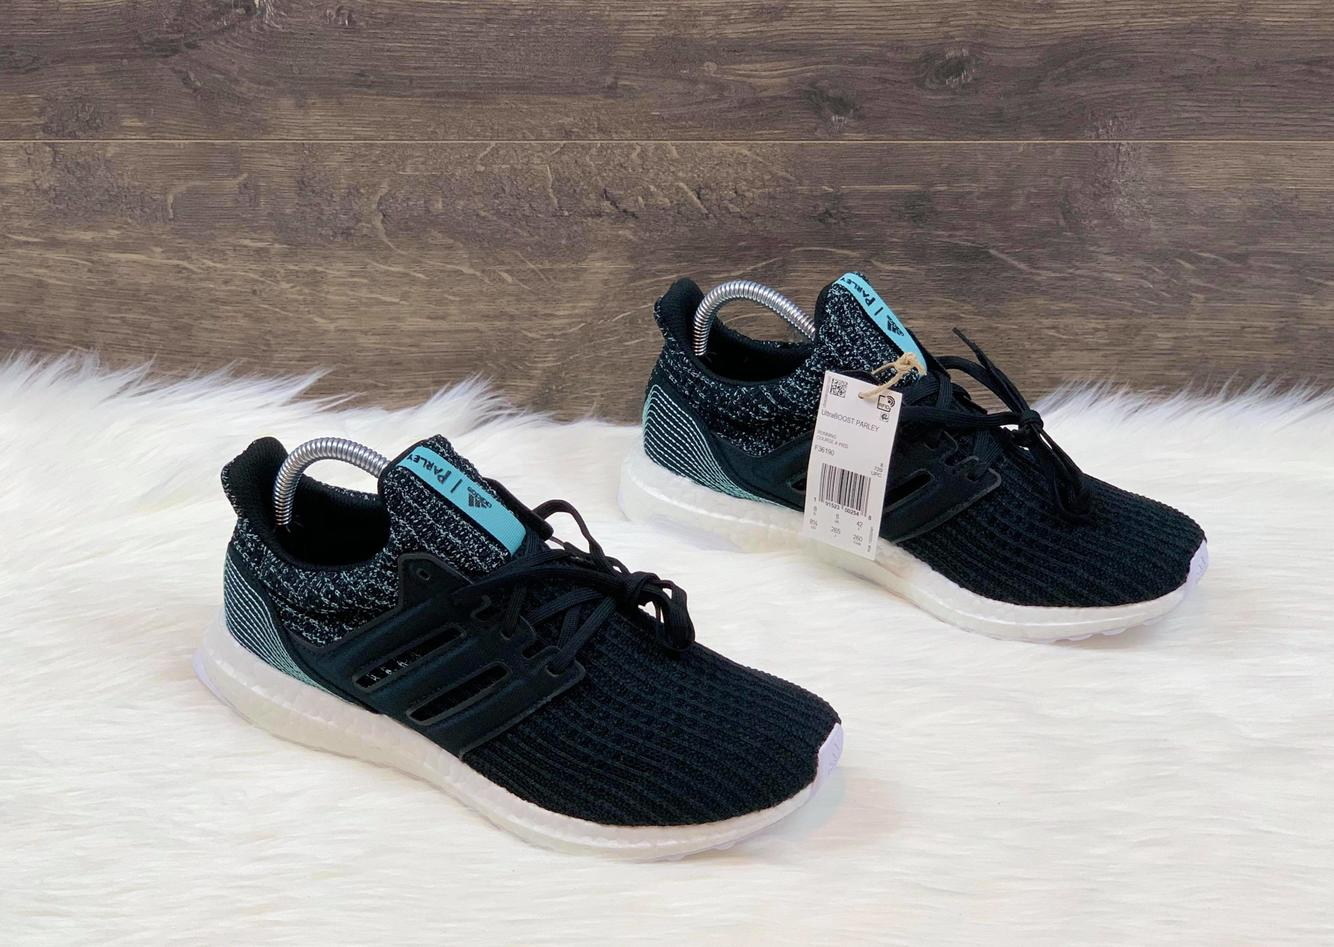 adidas ultra boost size 8.5